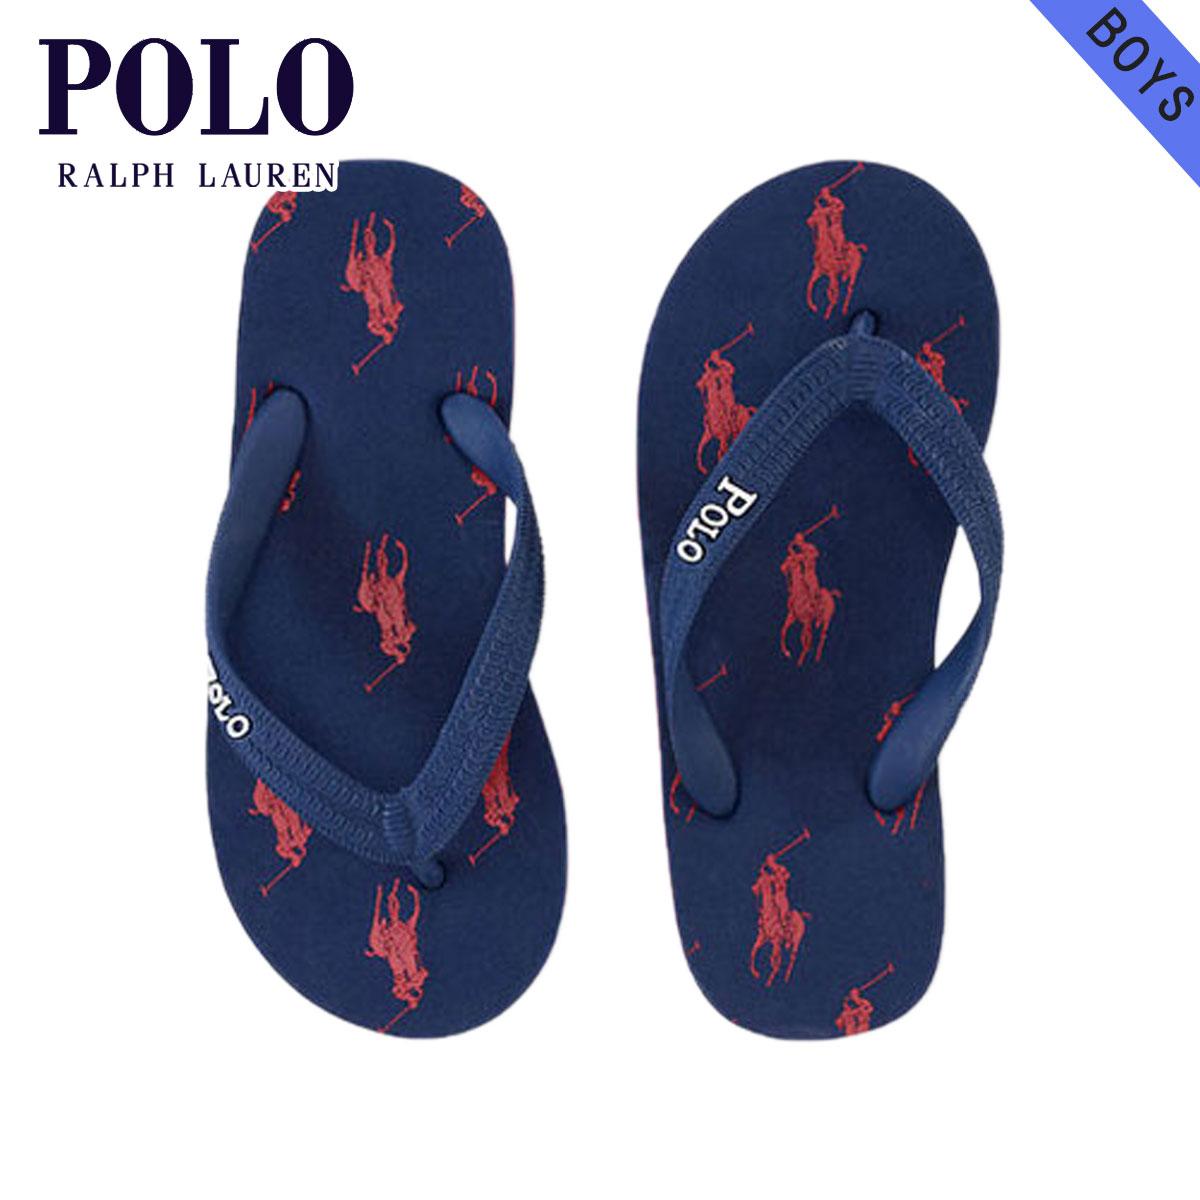 997679e7881 Polo Ralph Lauren kids sandals Boys children's clothes regular article POLO  RALPH LAUREN CHILDREN Amino Flip-Flop #16512186 D25S35